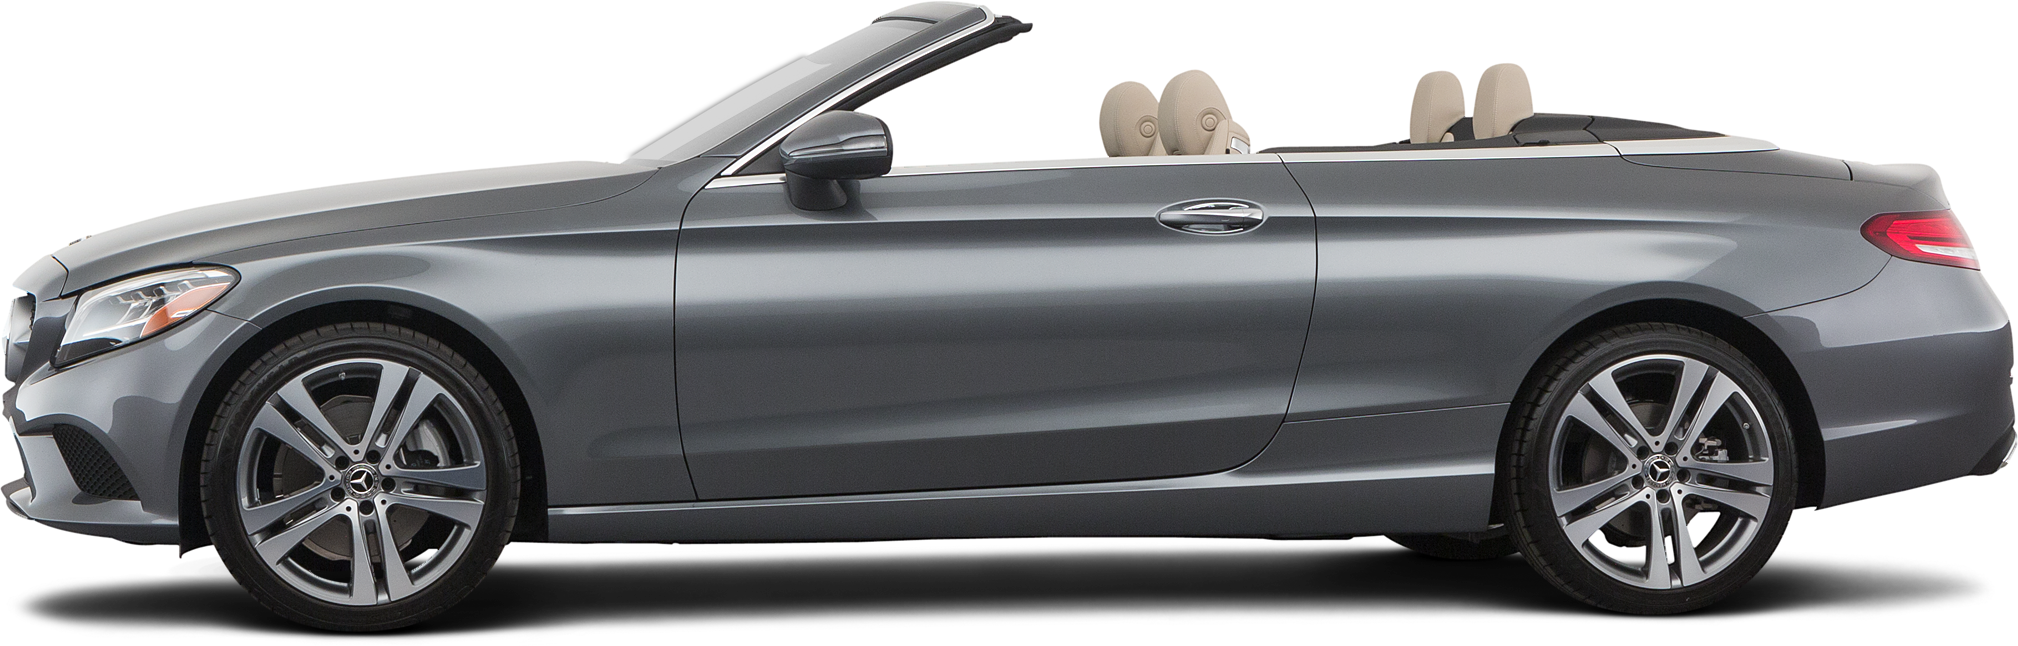 2020 Mercedes-Benz C-Class Cabriolet C 300